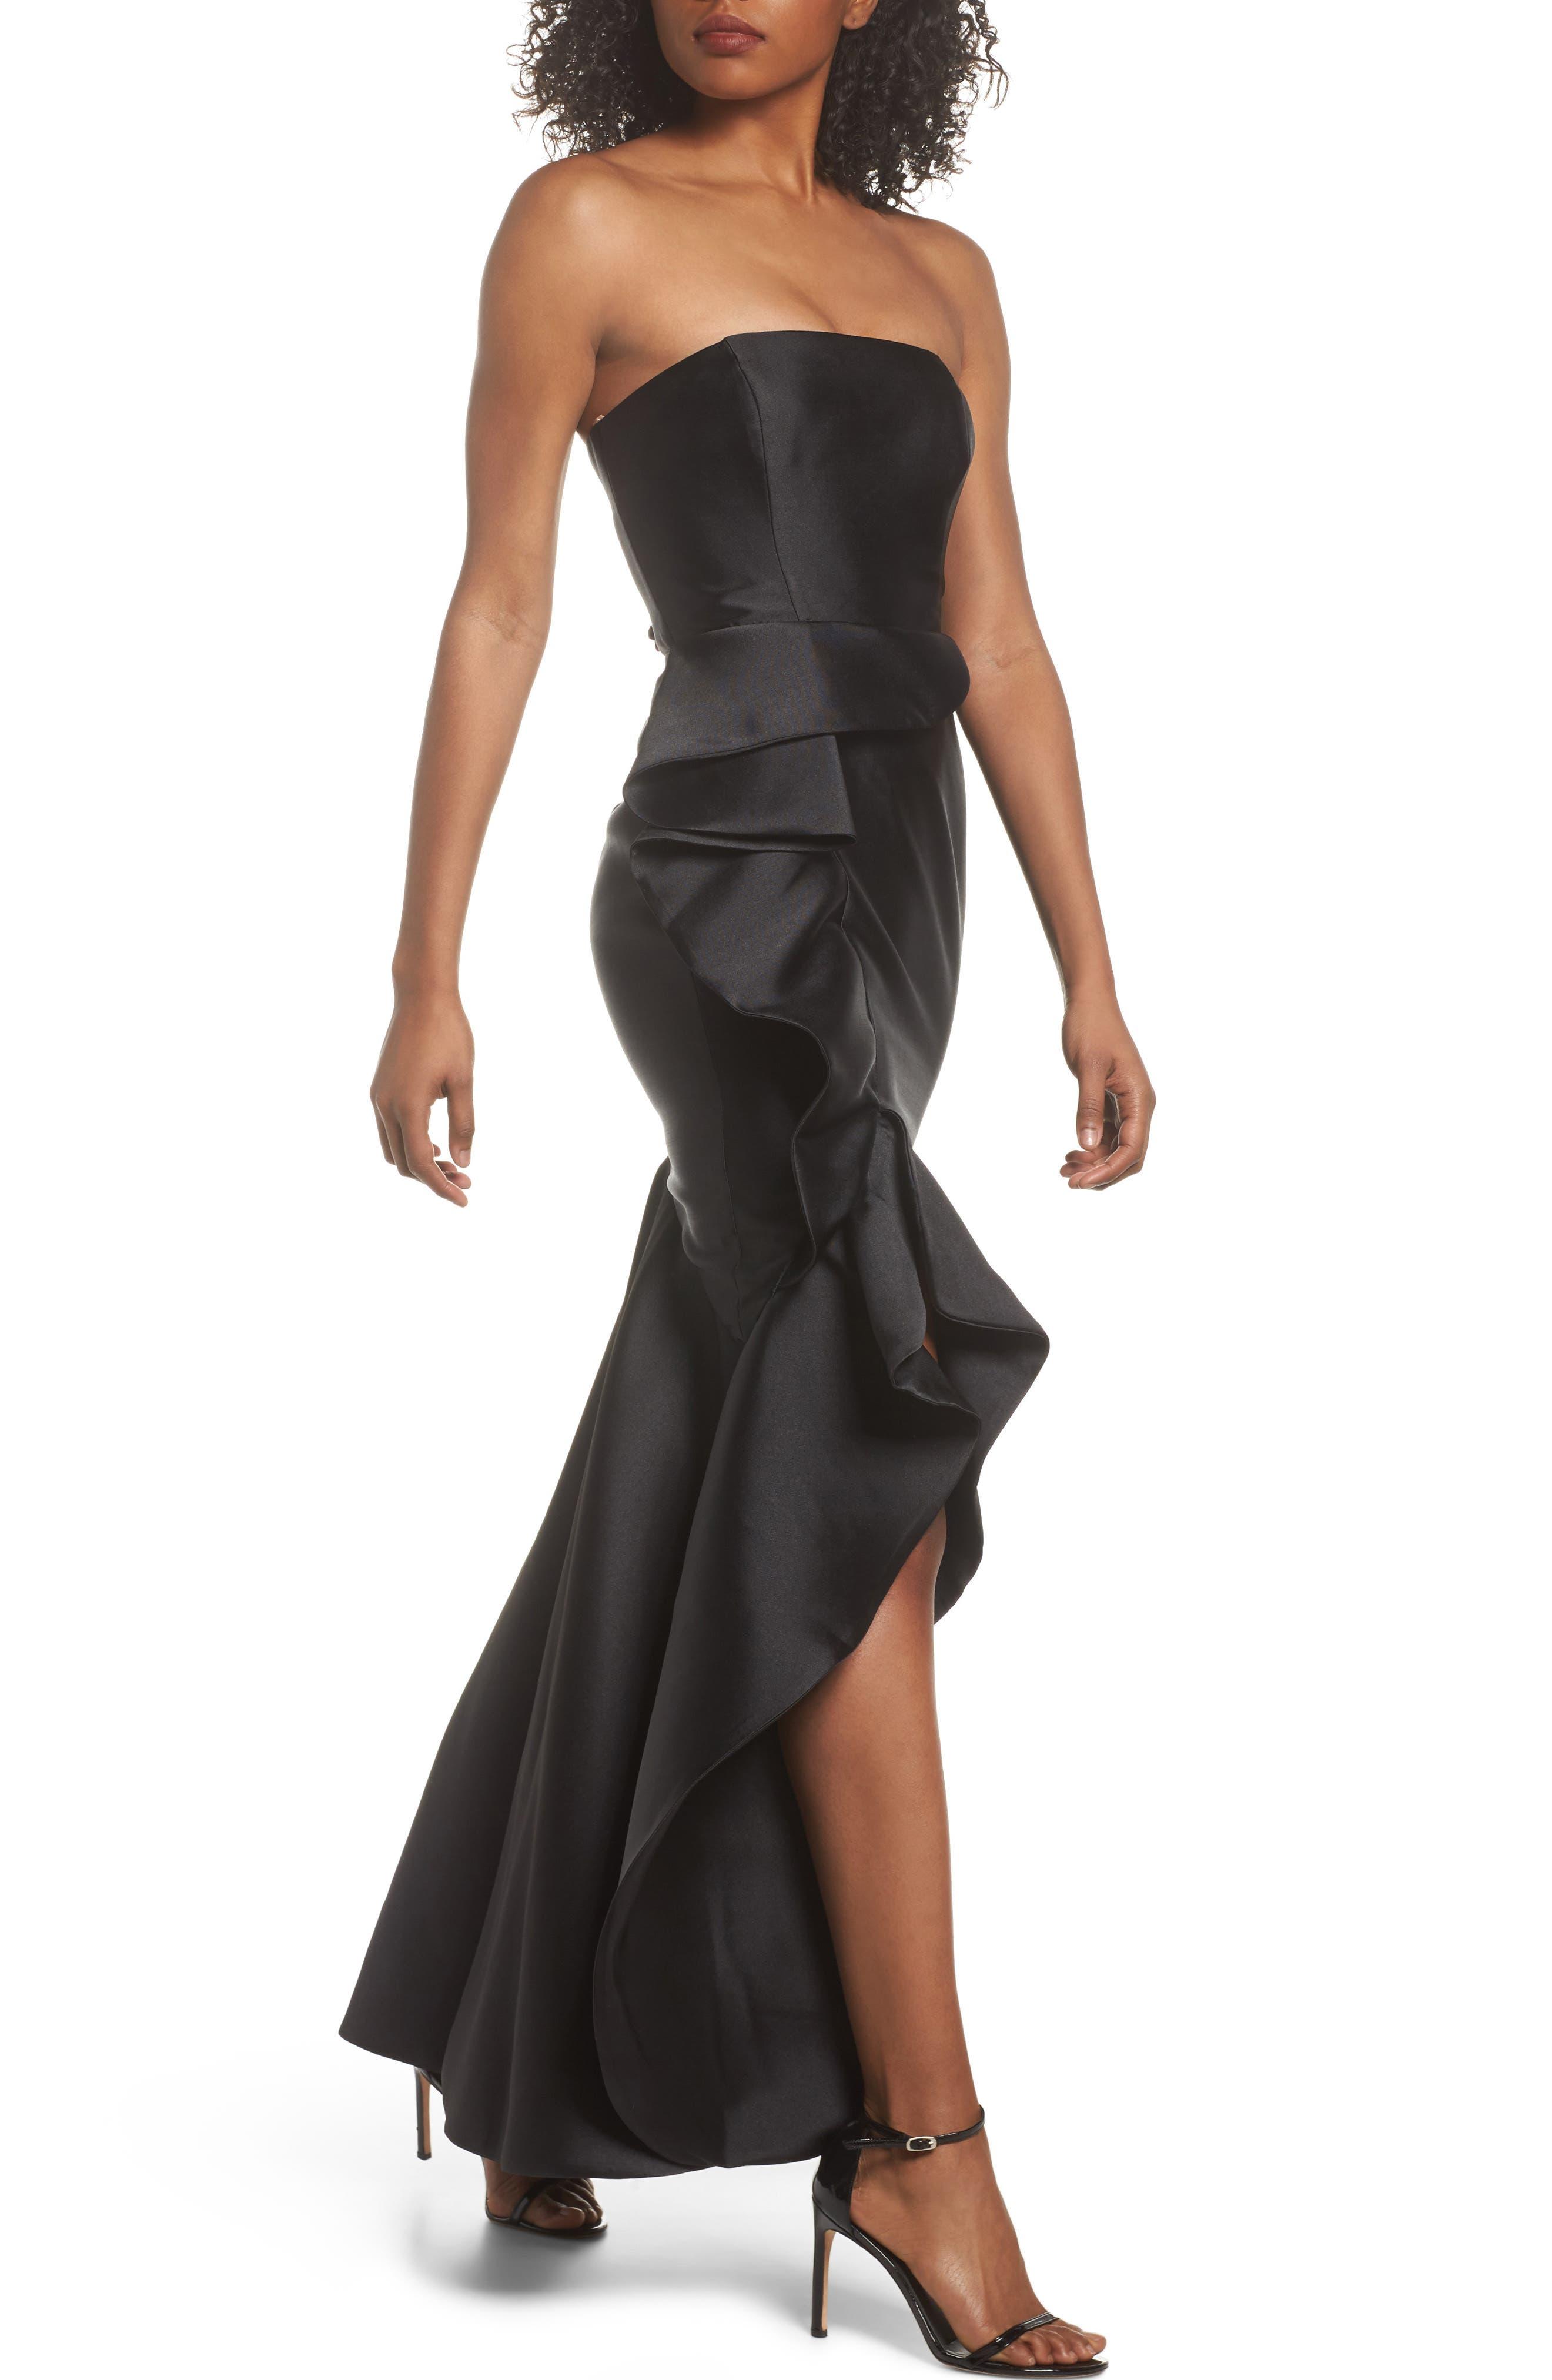 Sellers High/Low Mermaid Gown,                             Alternate thumbnail 2, color,                             Black